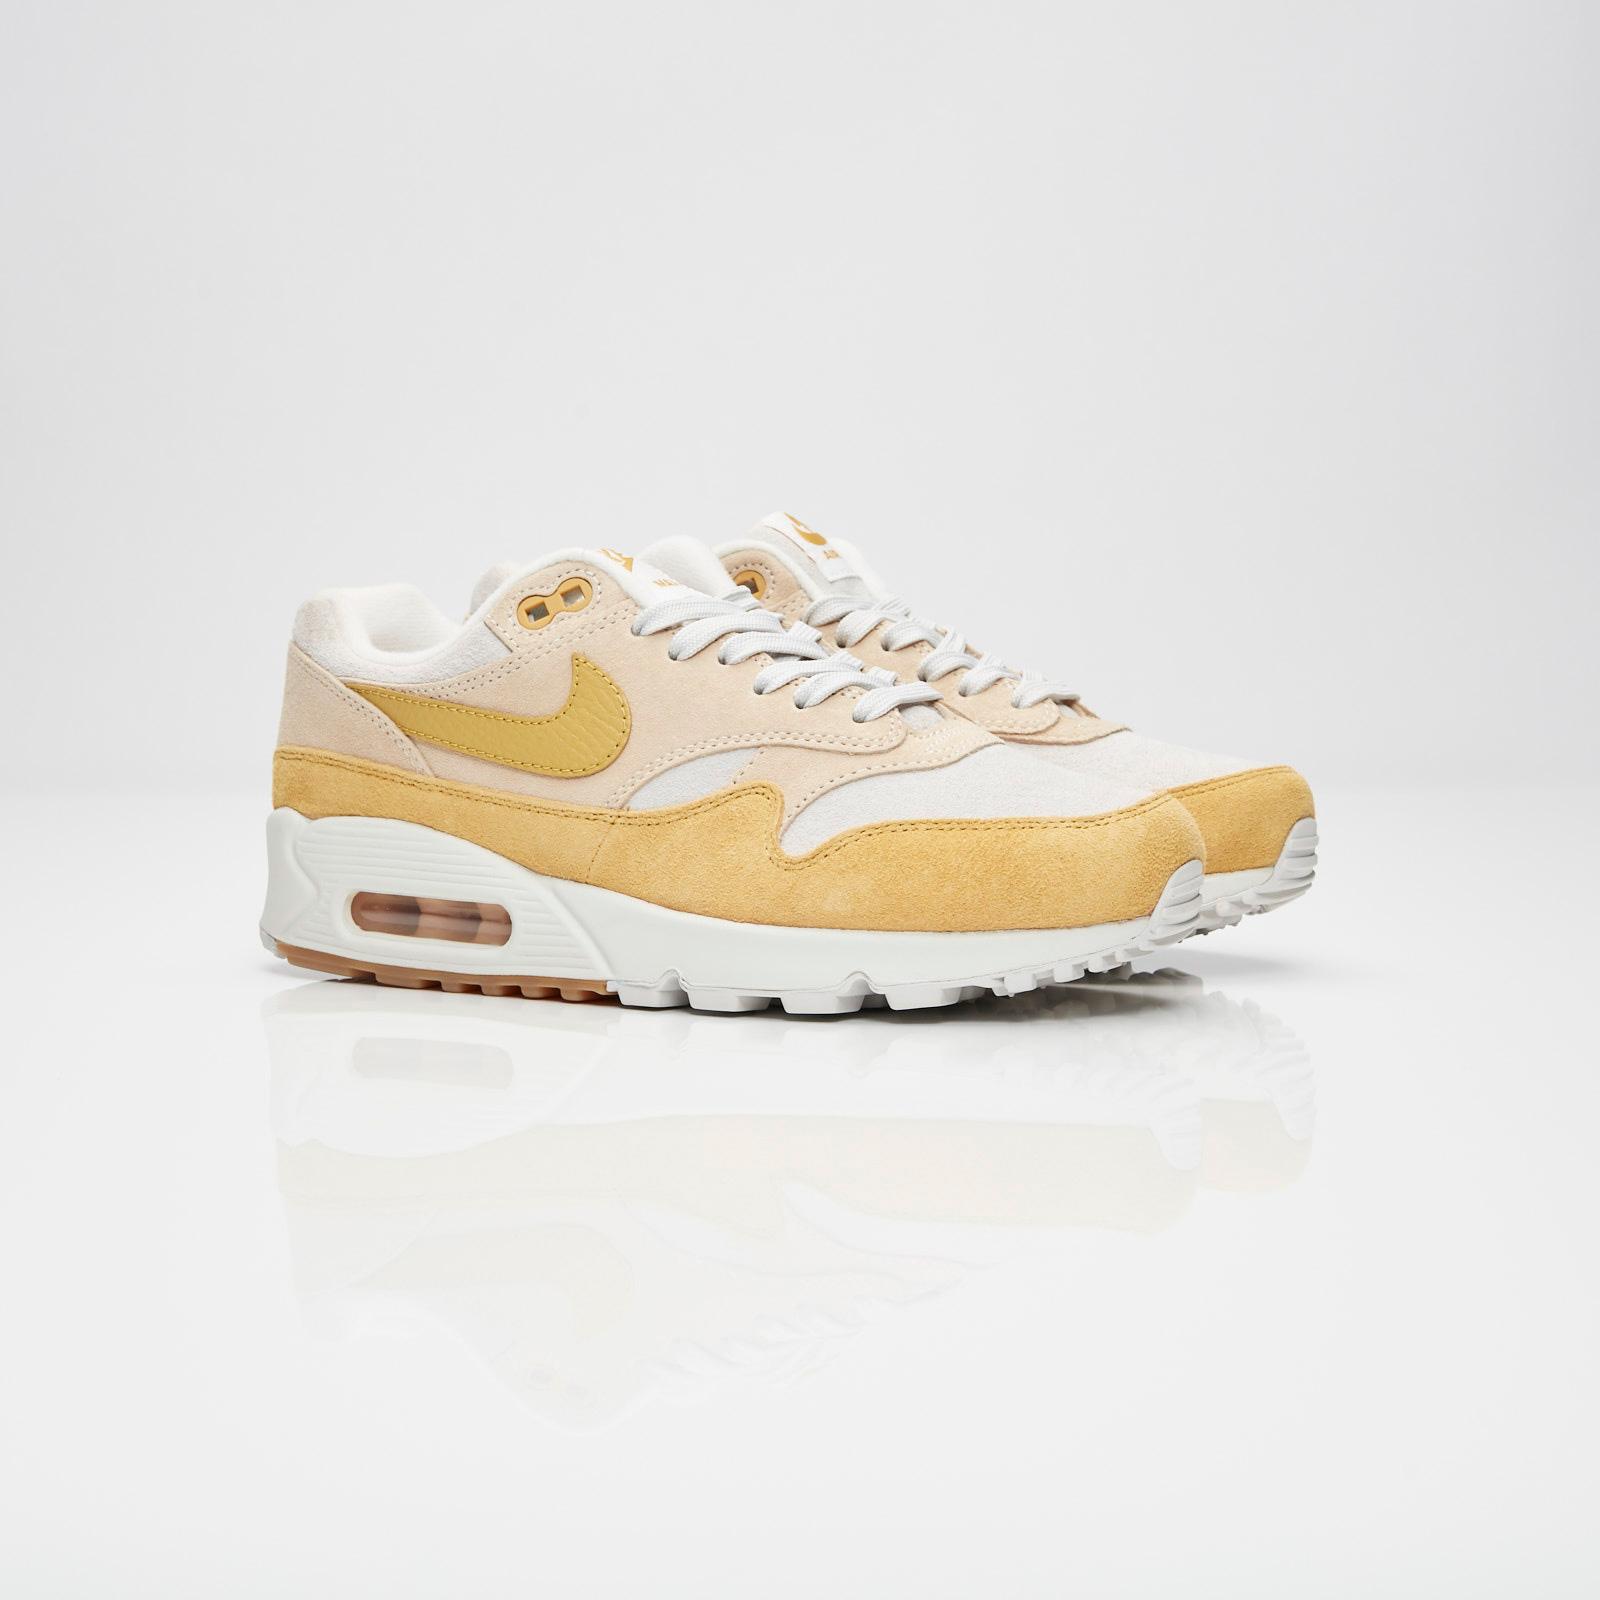 db62cee0bf Nike Wmns Air Max 90/1 - Aq1273-800 - Sneakersnstuff   sneakers ...